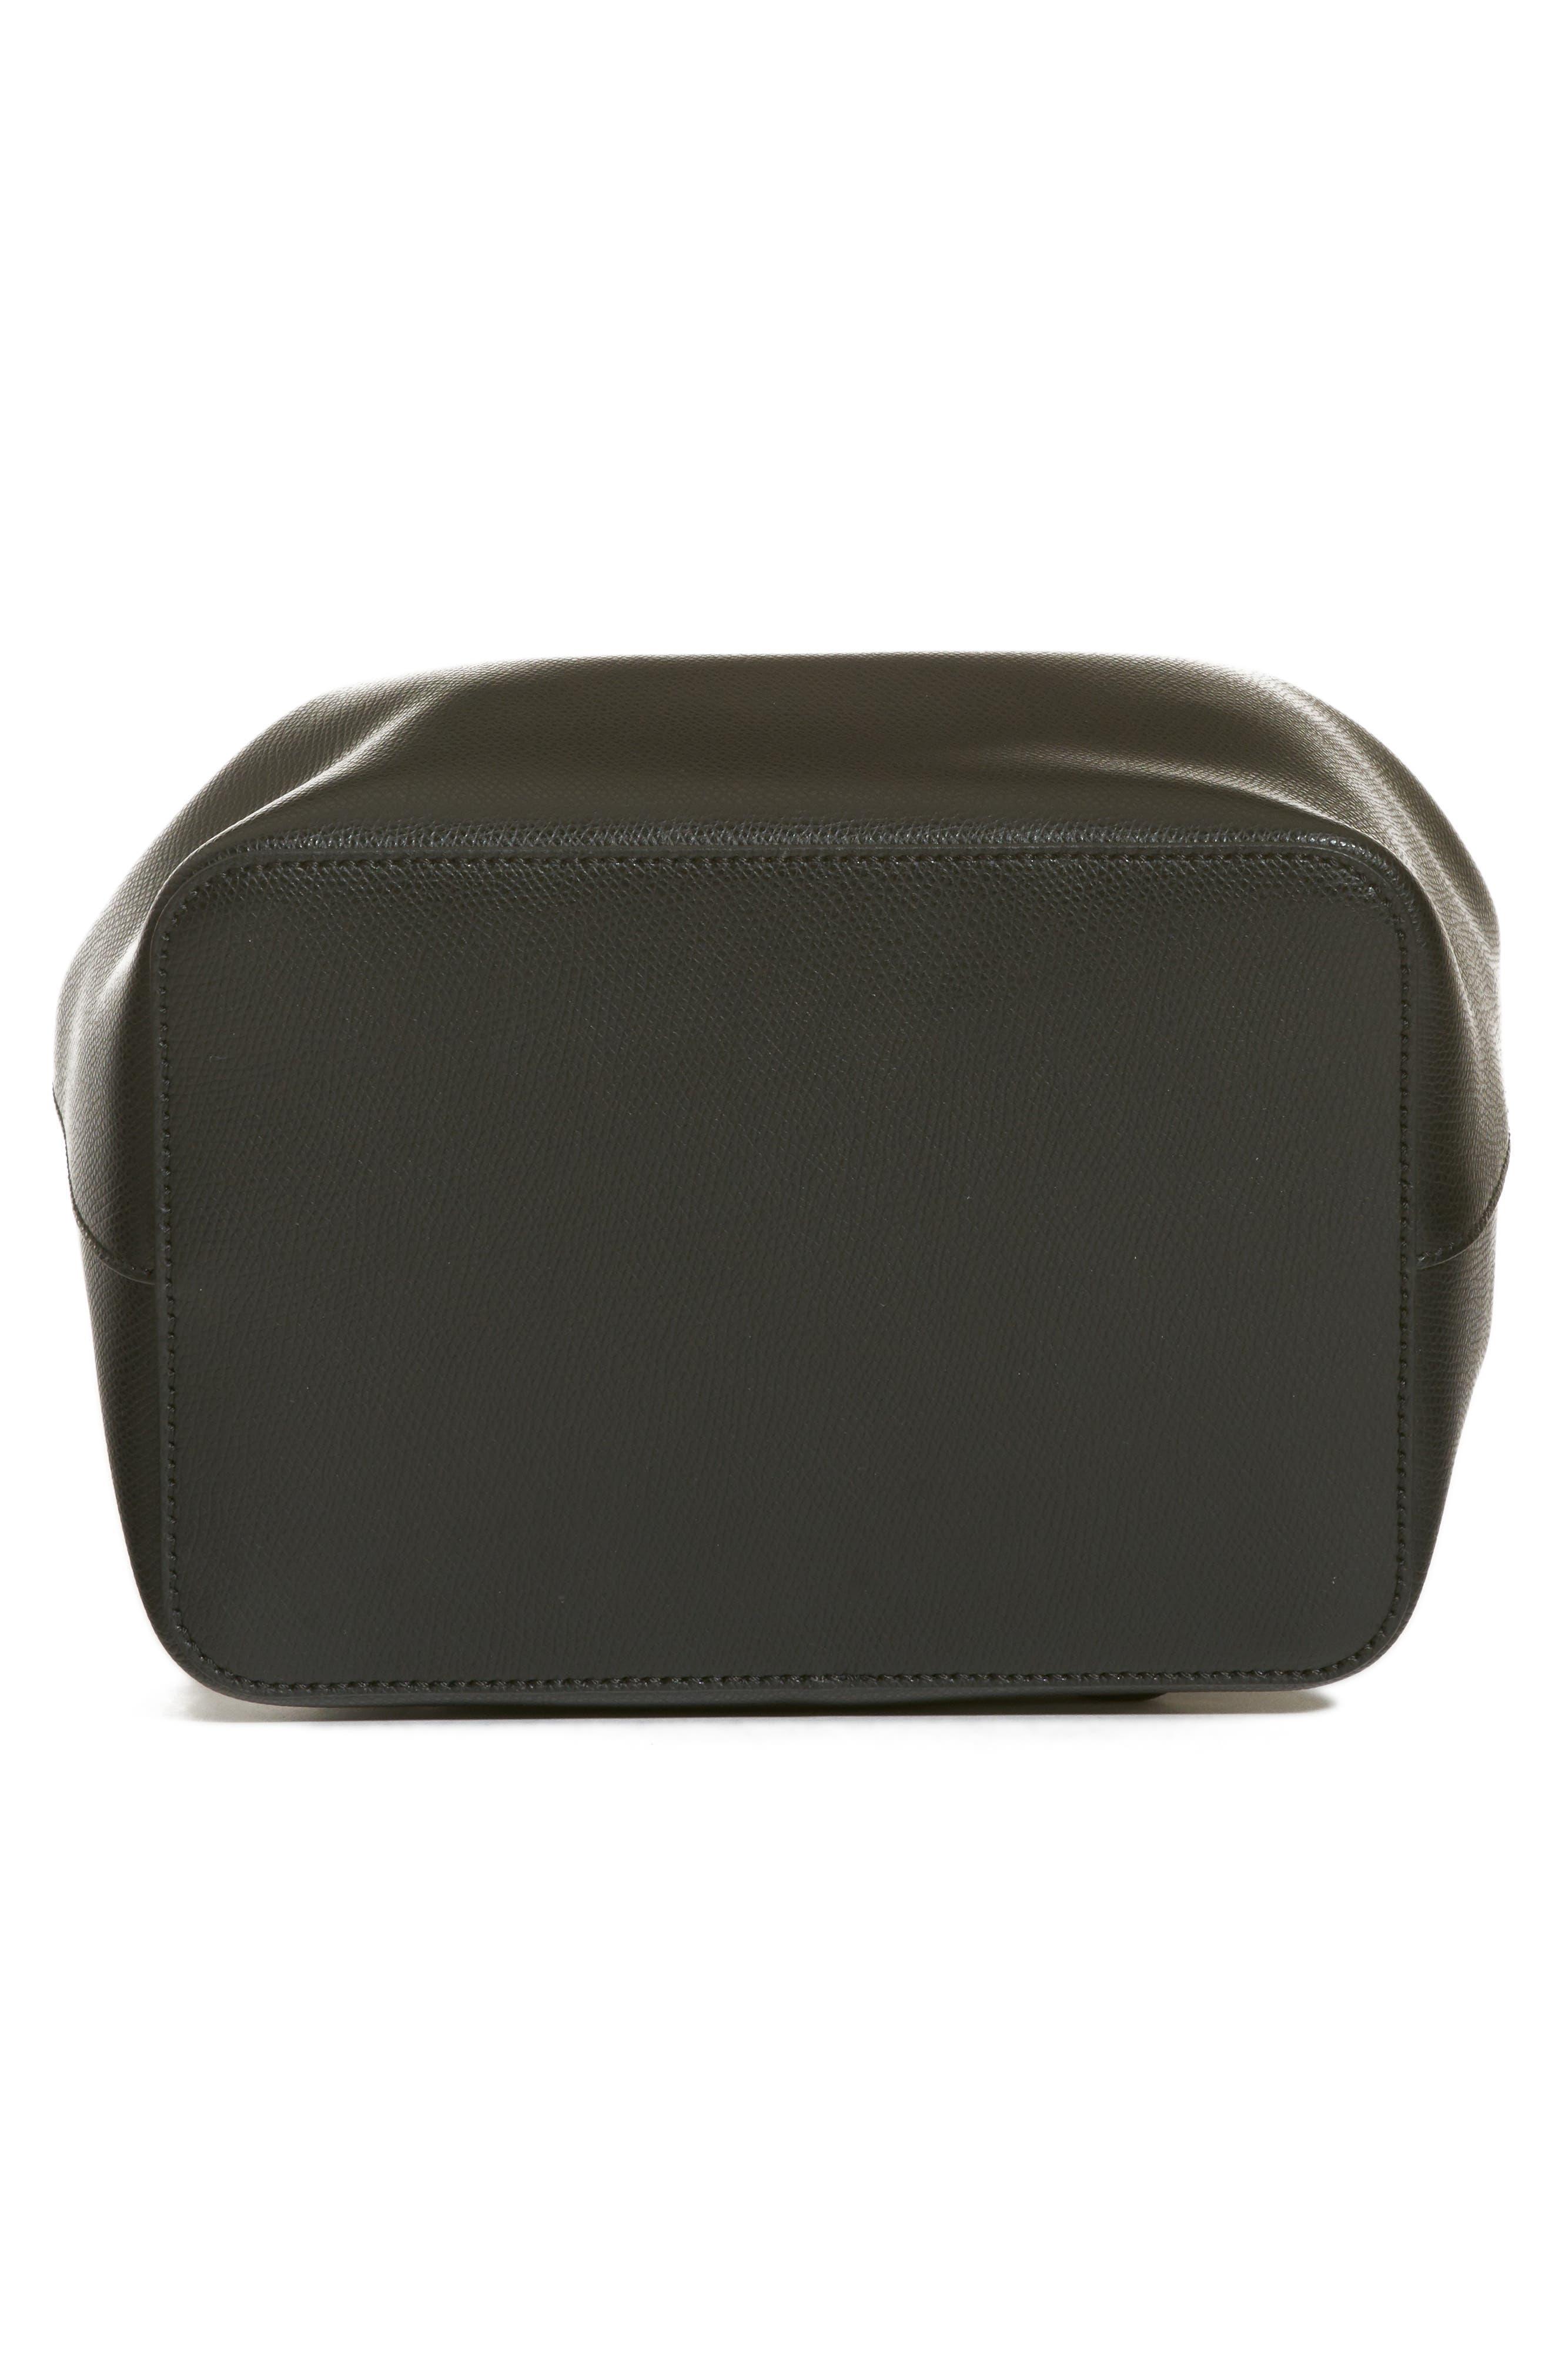 FENDI,                             Cruise Calfskin Leather Backpack,                             Alternate thumbnail 5, color,                             006